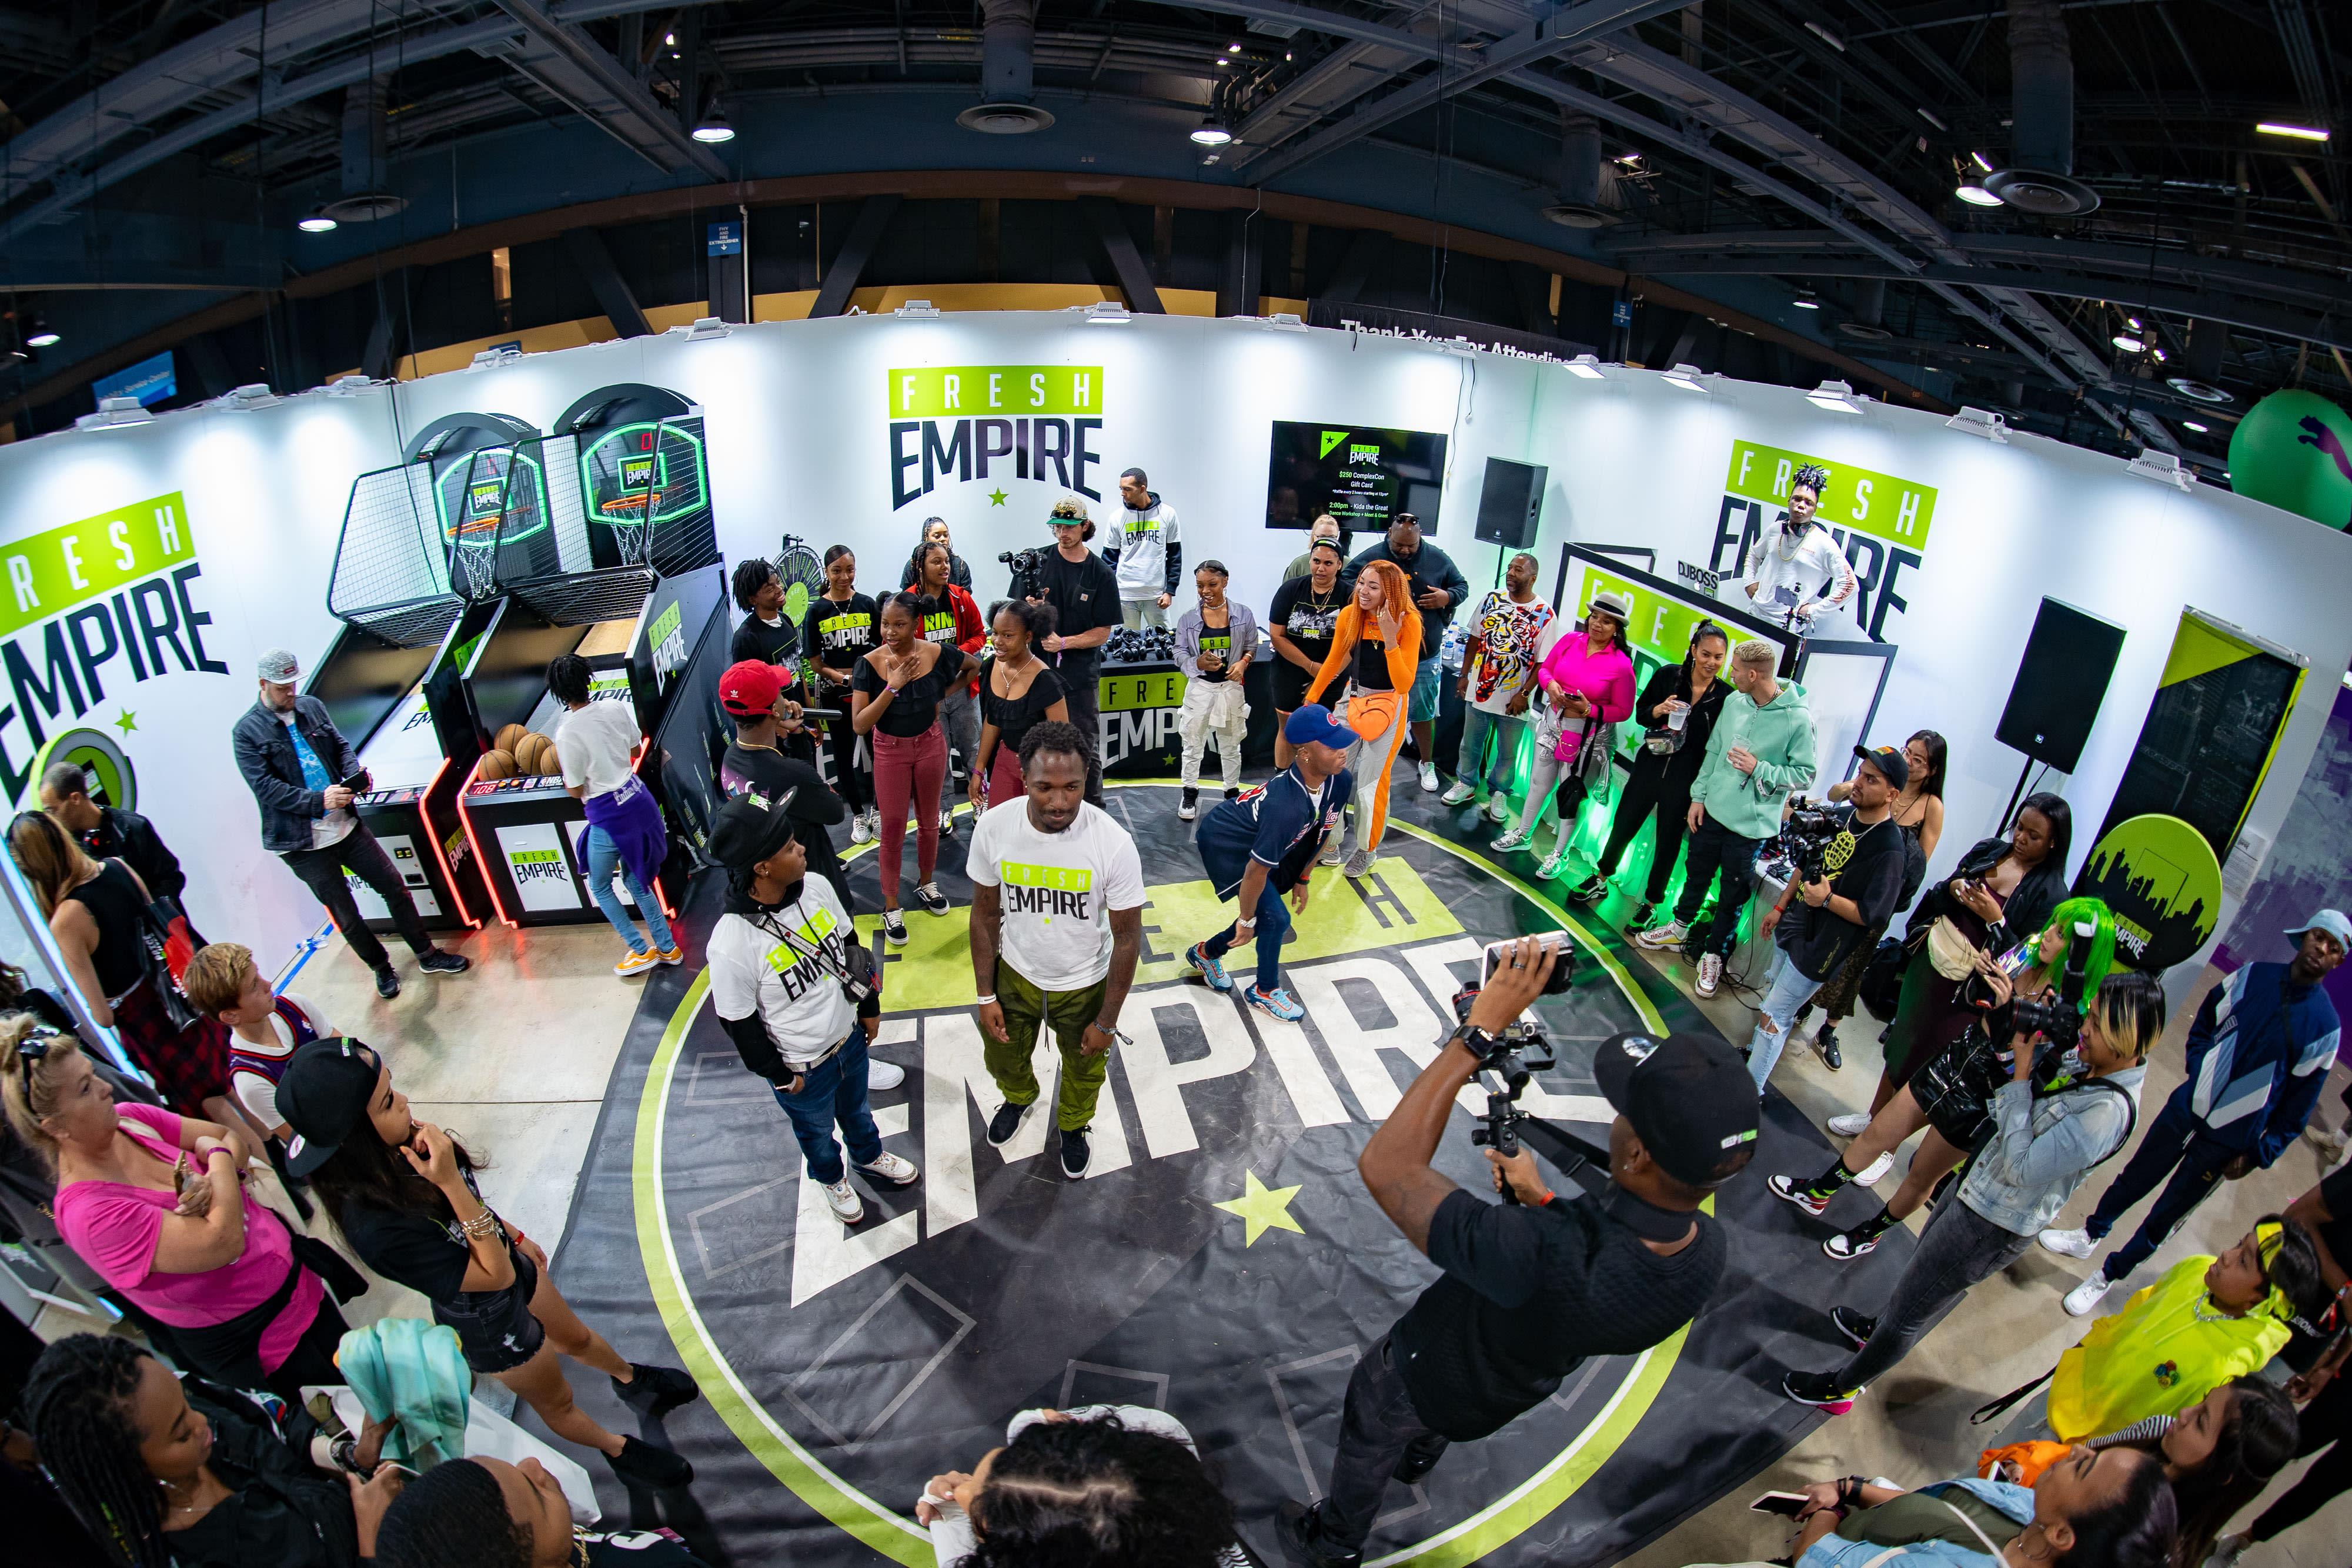 Fresh Empire ComplexCon 2019 Crowd Shot